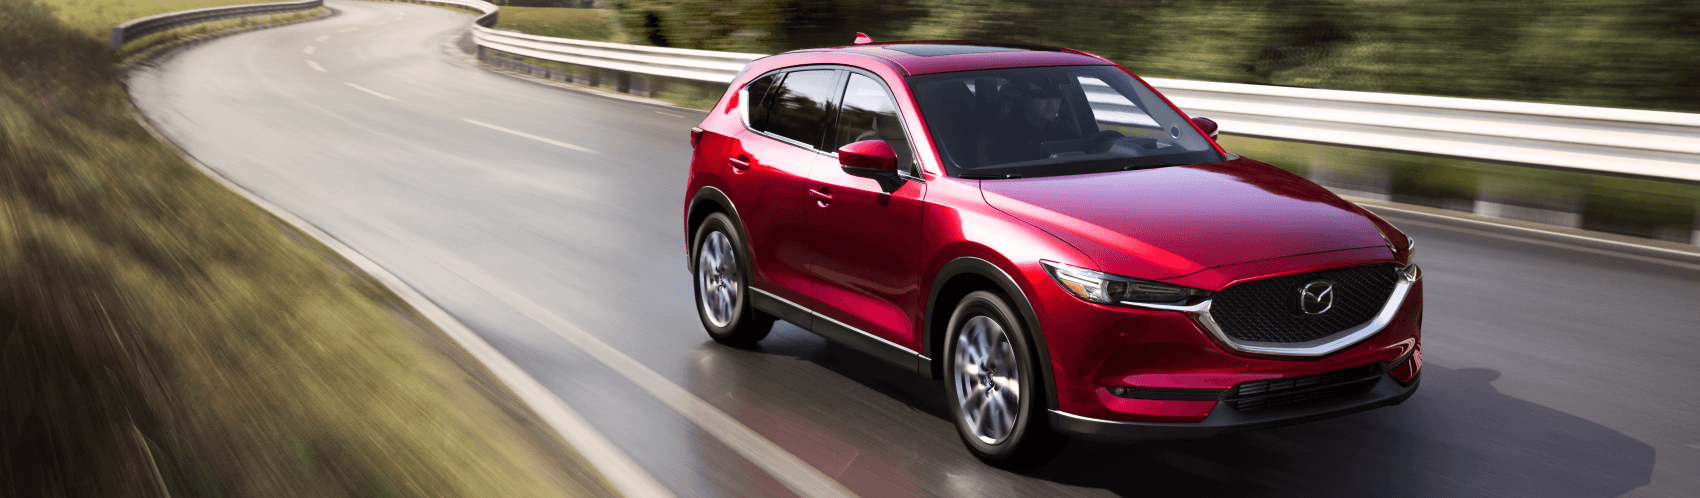 2021 Mazda CX-5 Red Highway Ocean Mazda